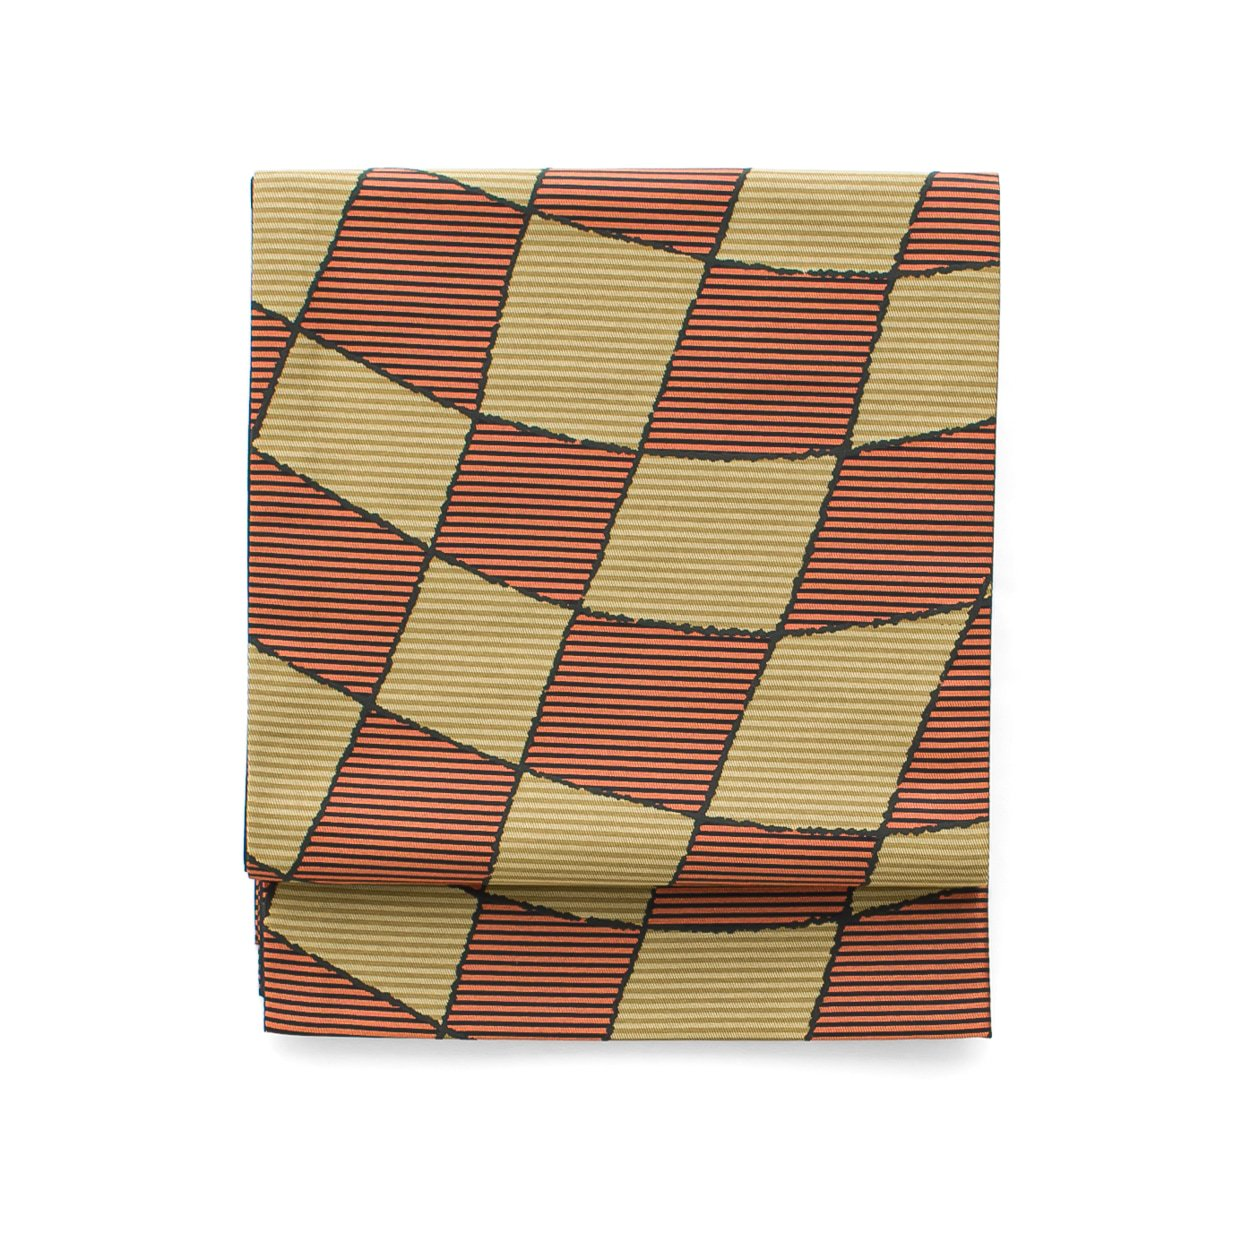 「京袋帯 変形市松」の商品画像